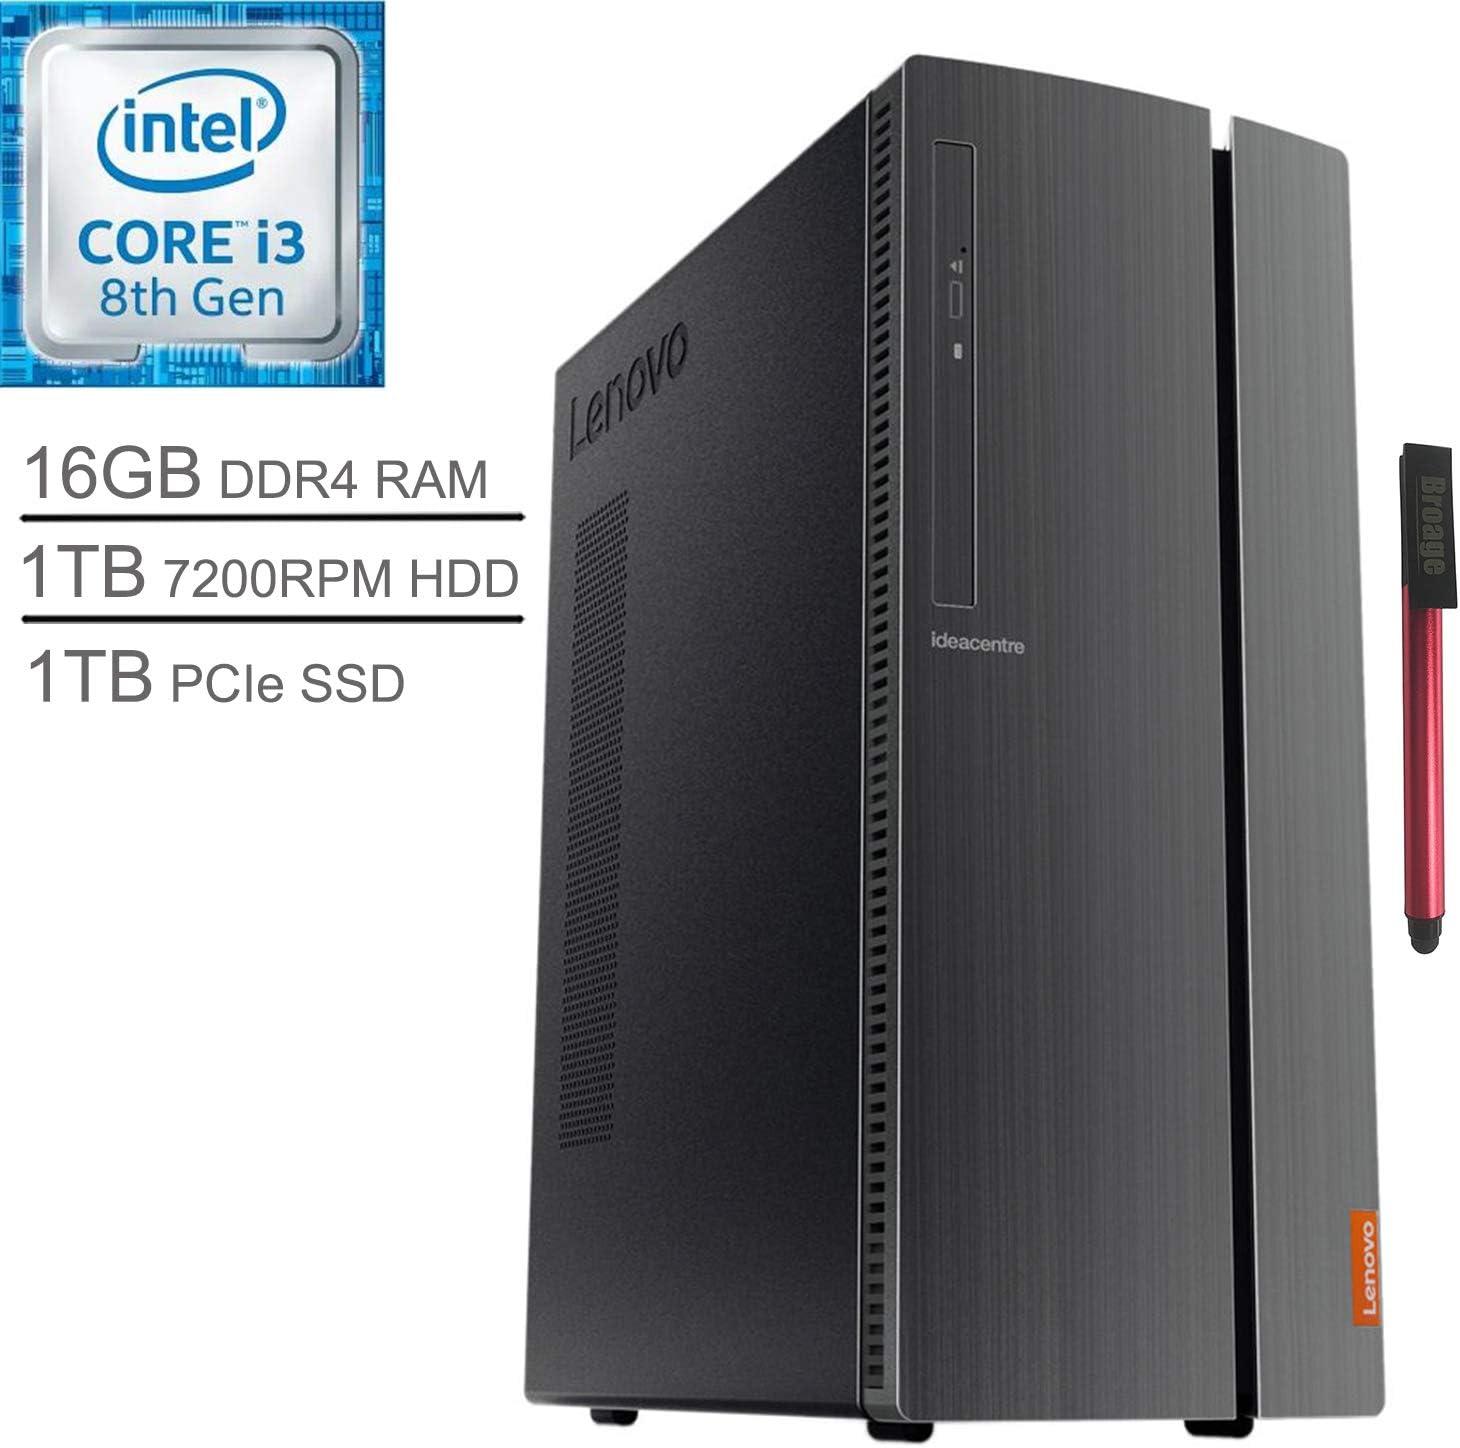 Lenovo IdeaCentre 510A Desktop Computer_ Intel Quad-Core i3-8100 3.6GHz (Beats i5-7500)_ 16GB DDR4 RAM_ 1TB 7200RPM HDD + 1TB PCIe SSD_ DVDRW_ 802.11AC WiFi_ Windows 10_ BROAGE 64GB Flash Drive